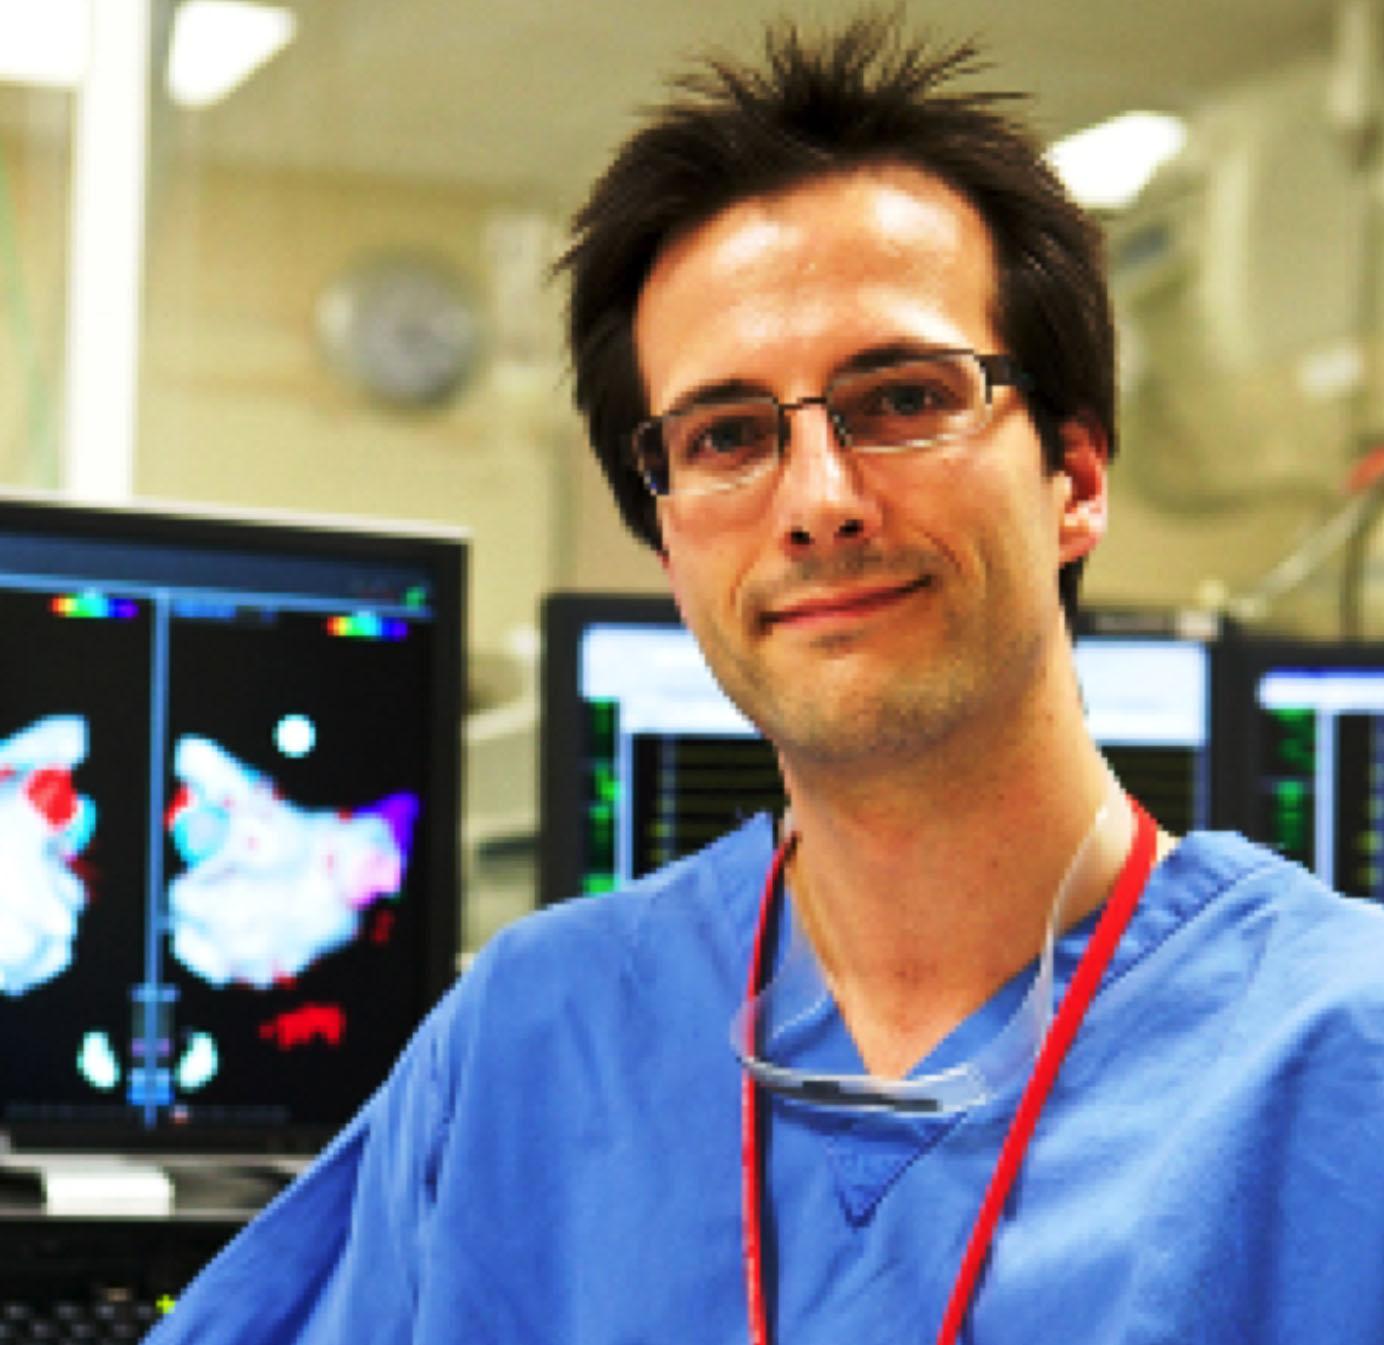 Dr Will Nicolson